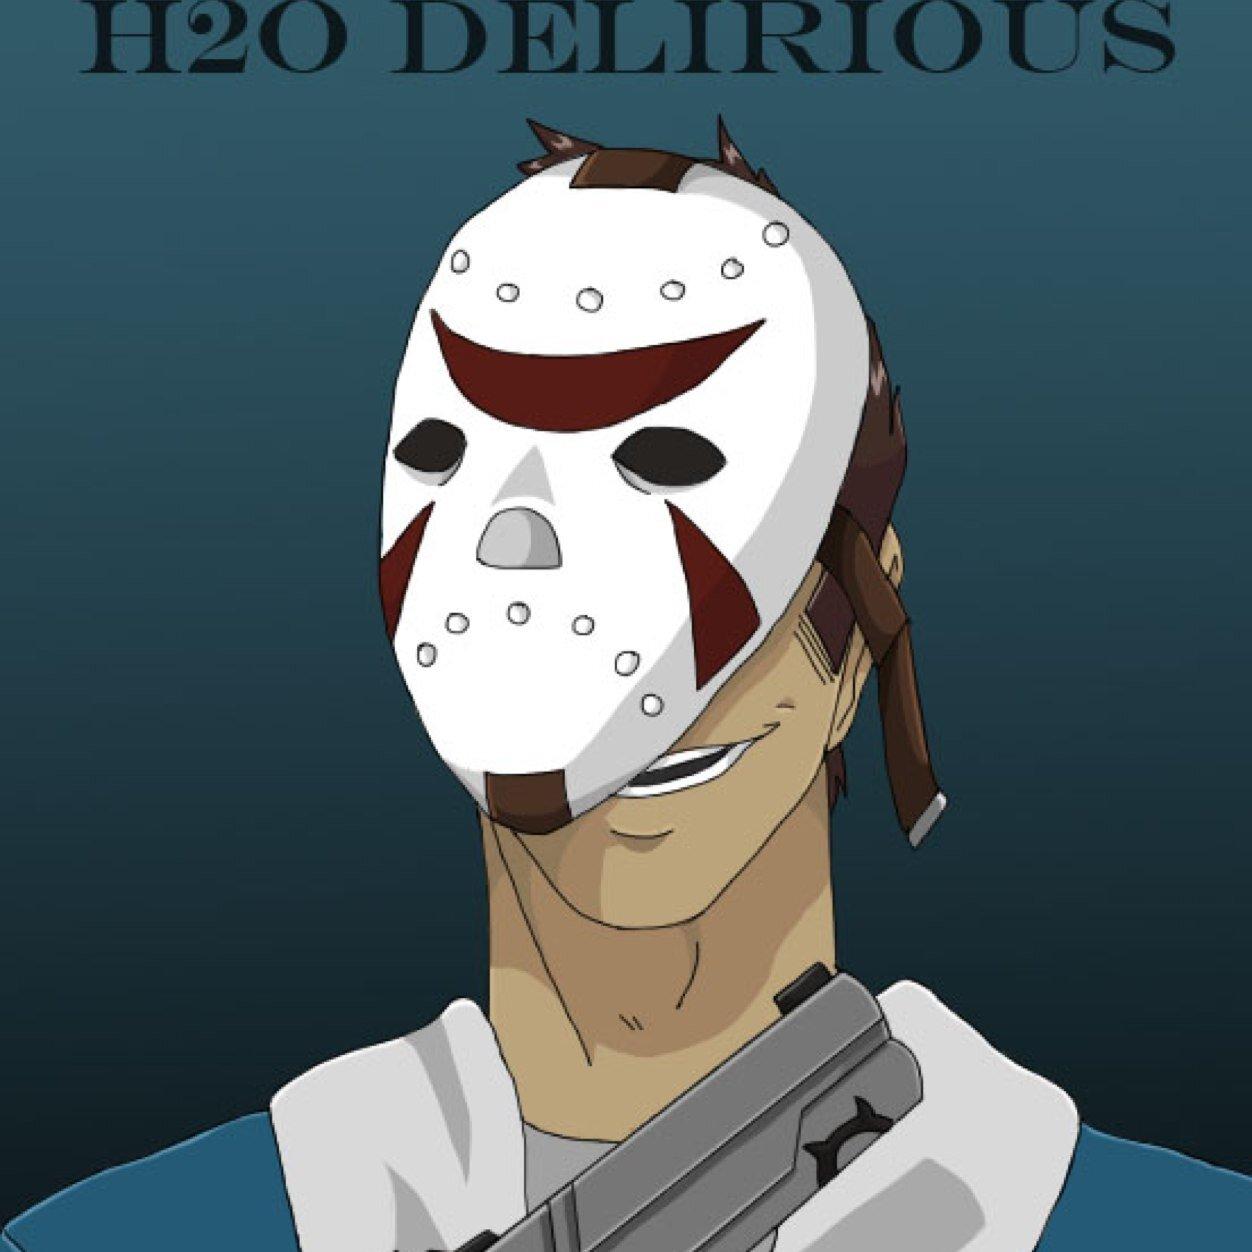 H20Delirious FAN ART (@H20DeliriousART) | Twitter H20 Delirious Fan Art